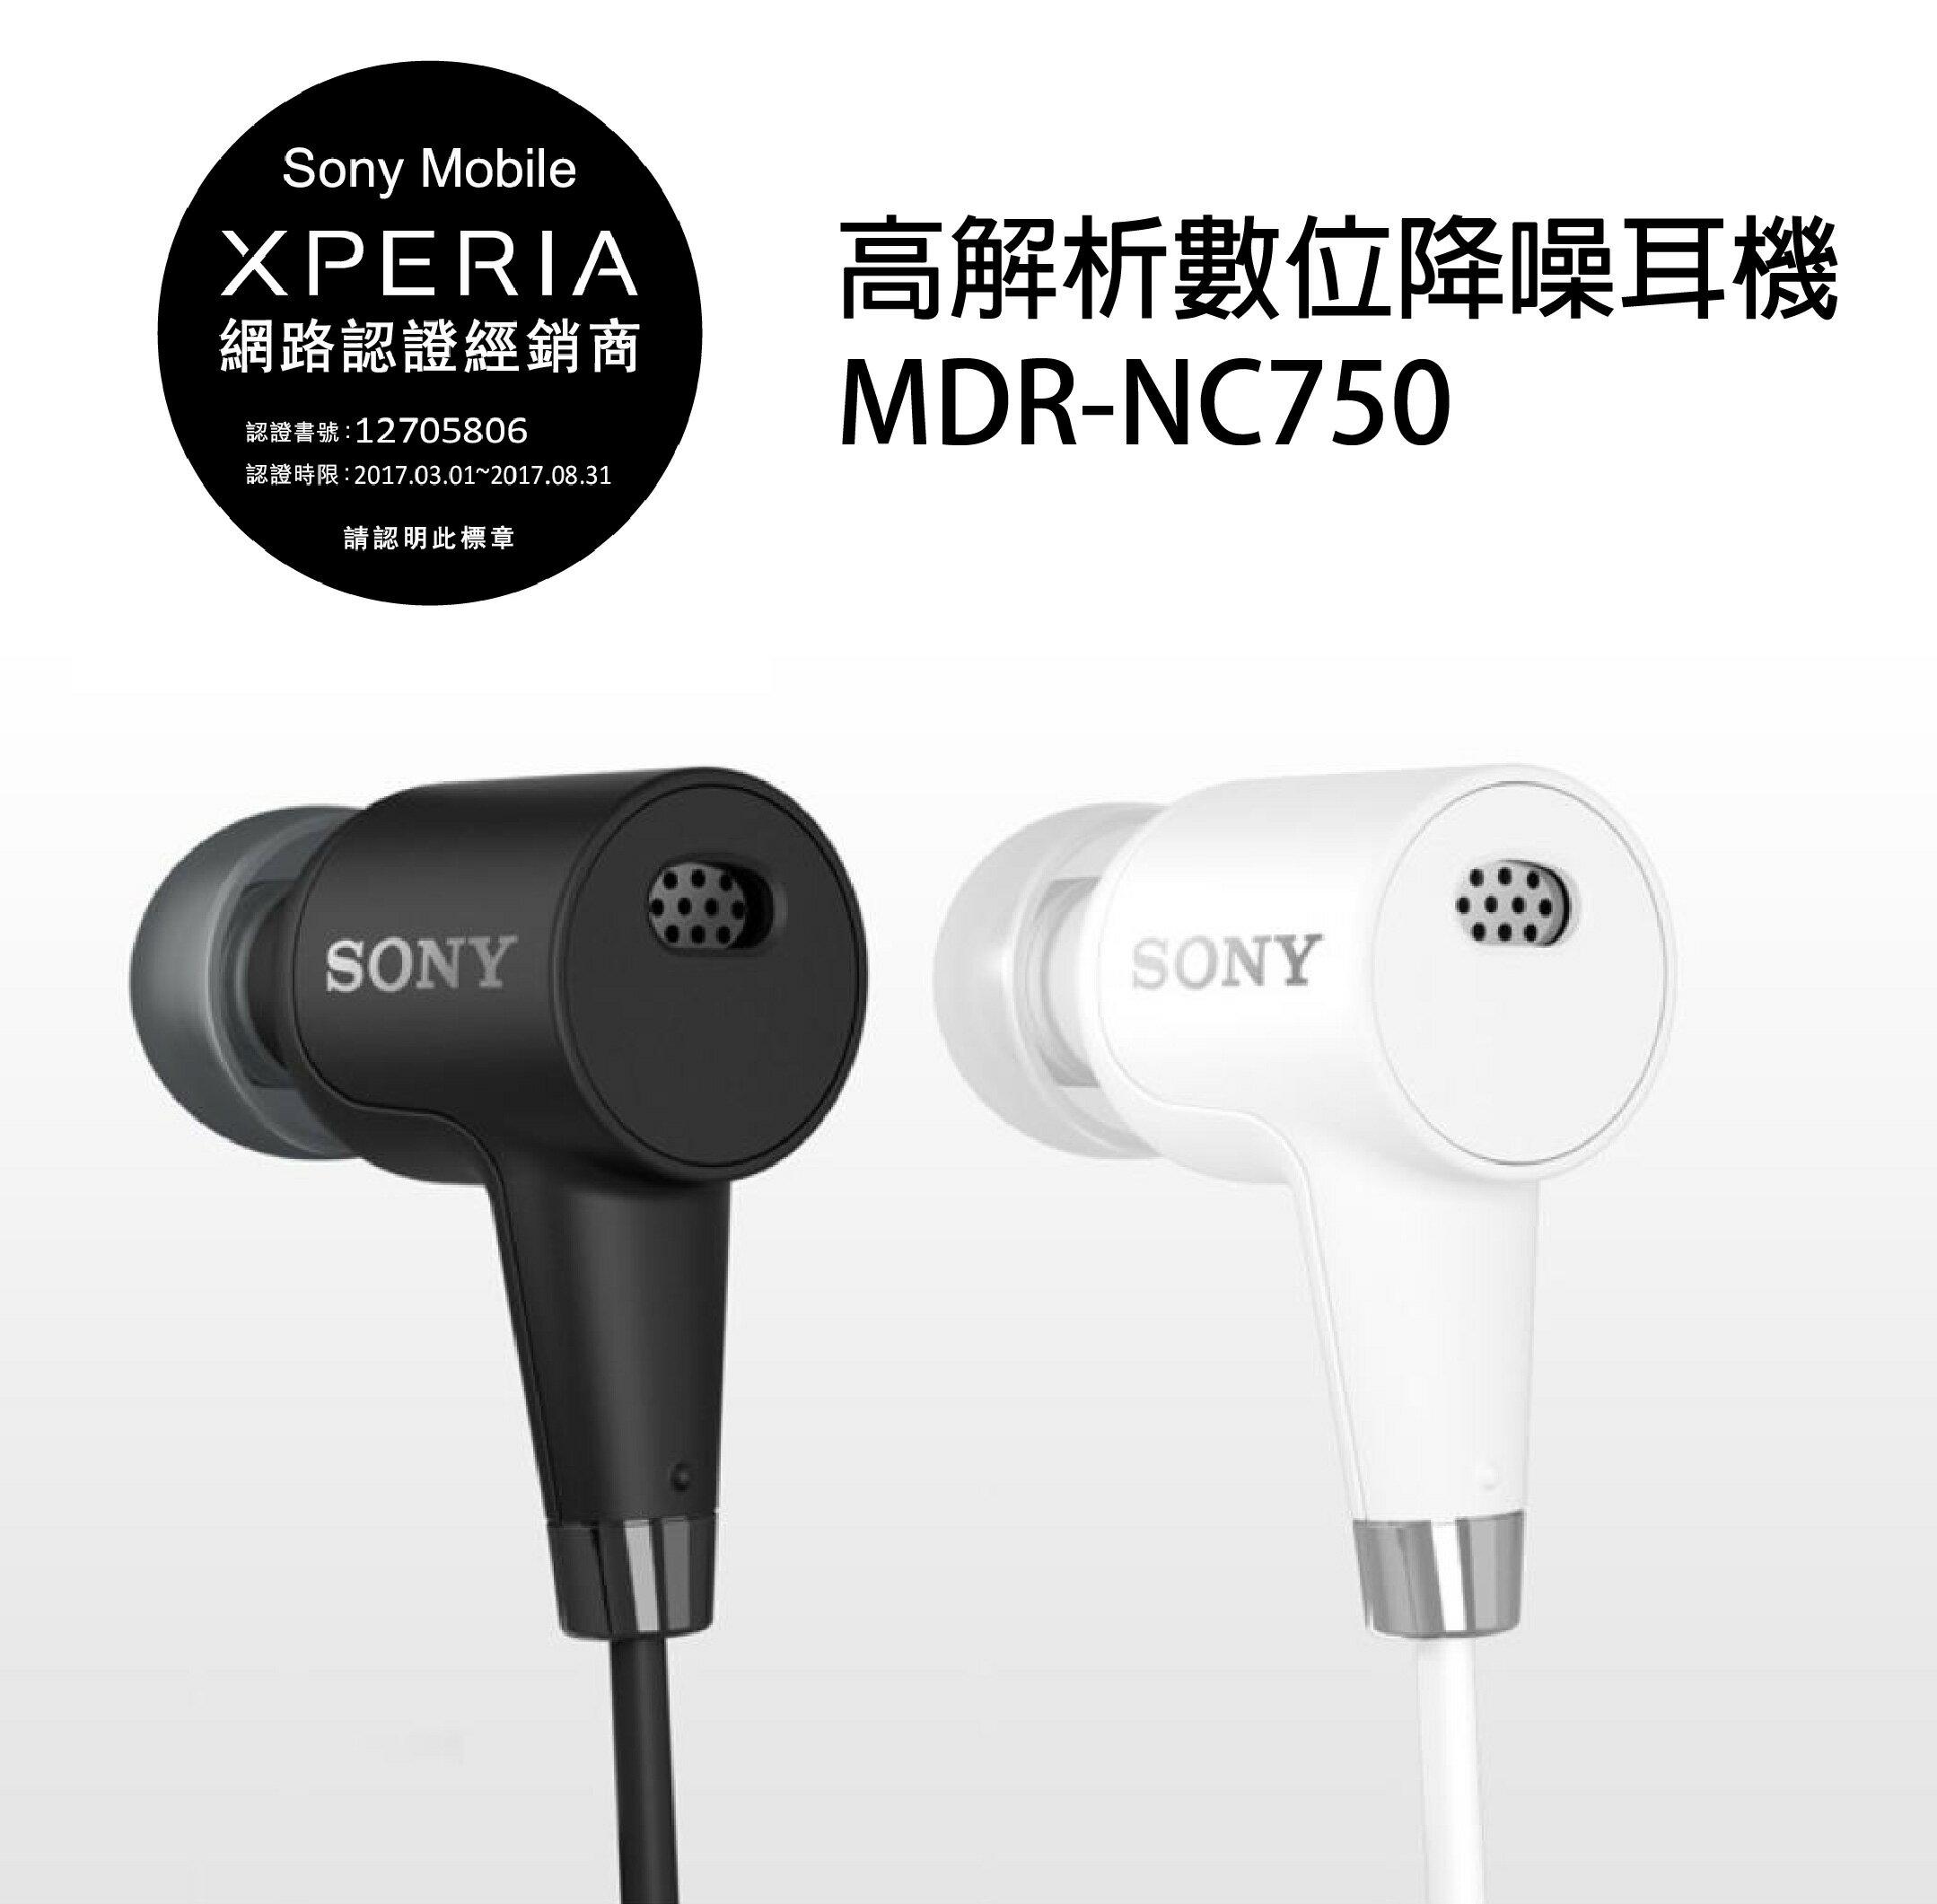 SONY MDR-NC750 高解析音訊耳機,人體工學設計,提升聽覺饗宴,僅適用SONY Z5系列手機,神腦代理